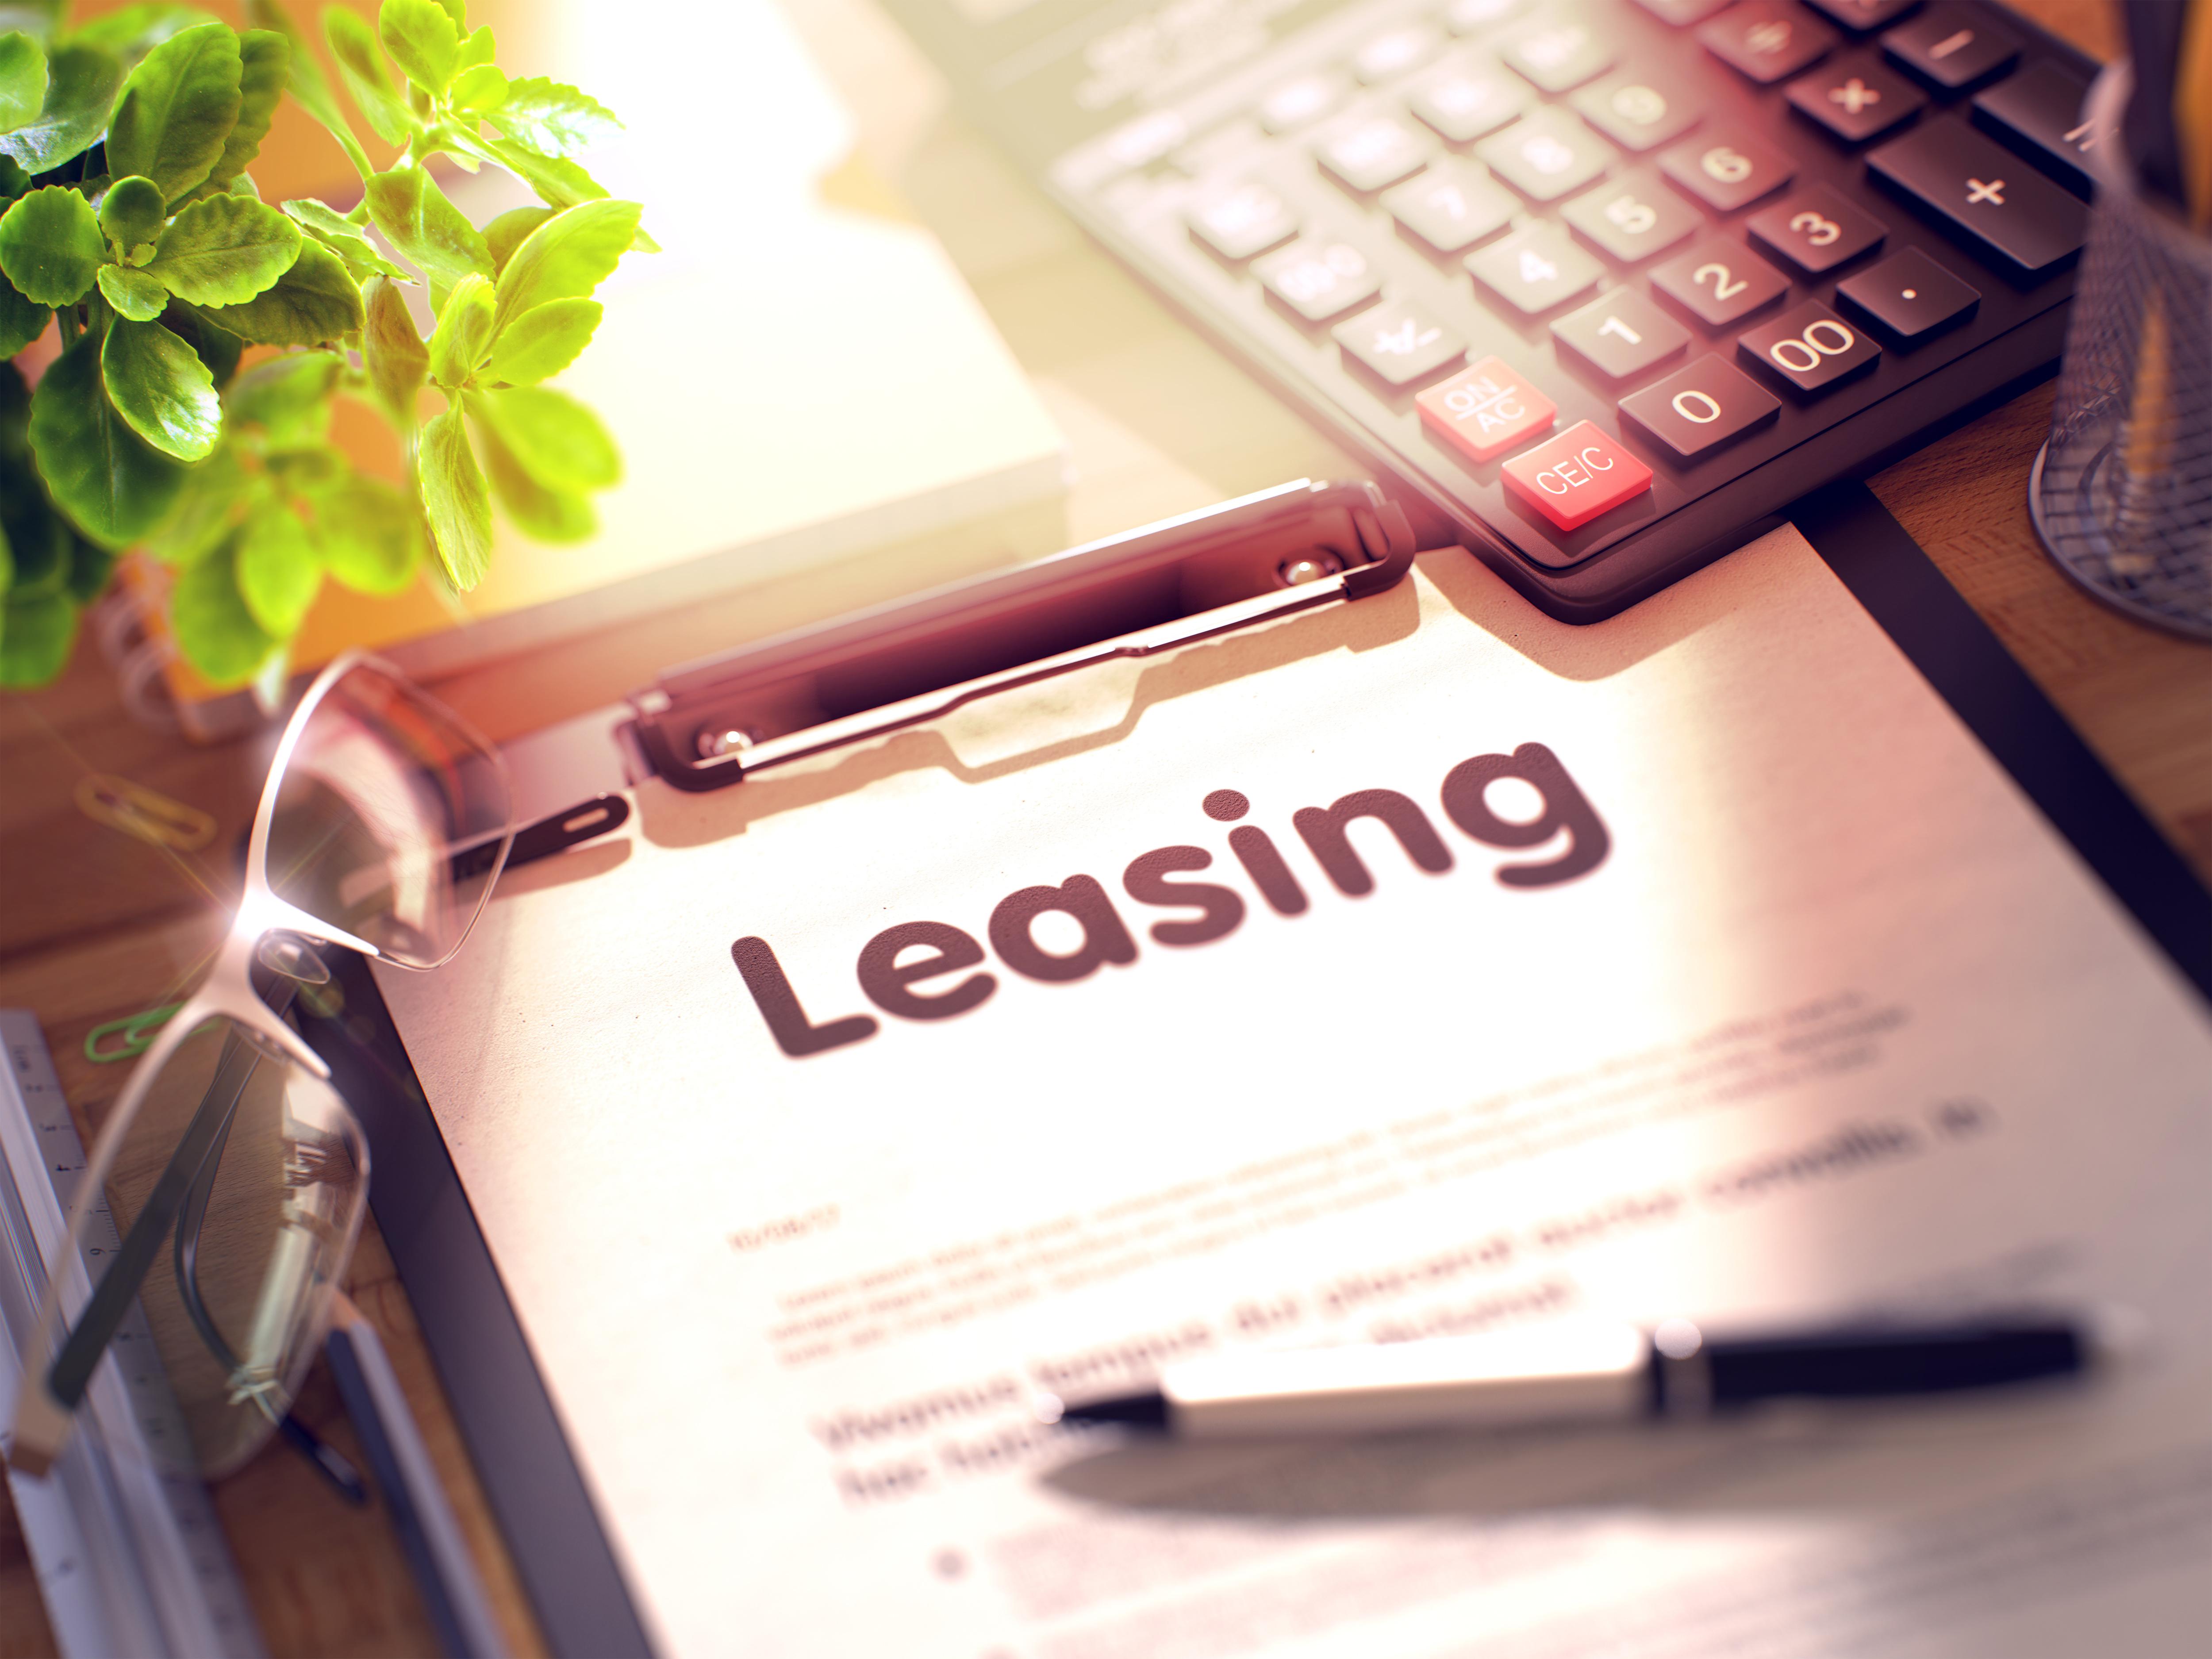 Direktes Leasing